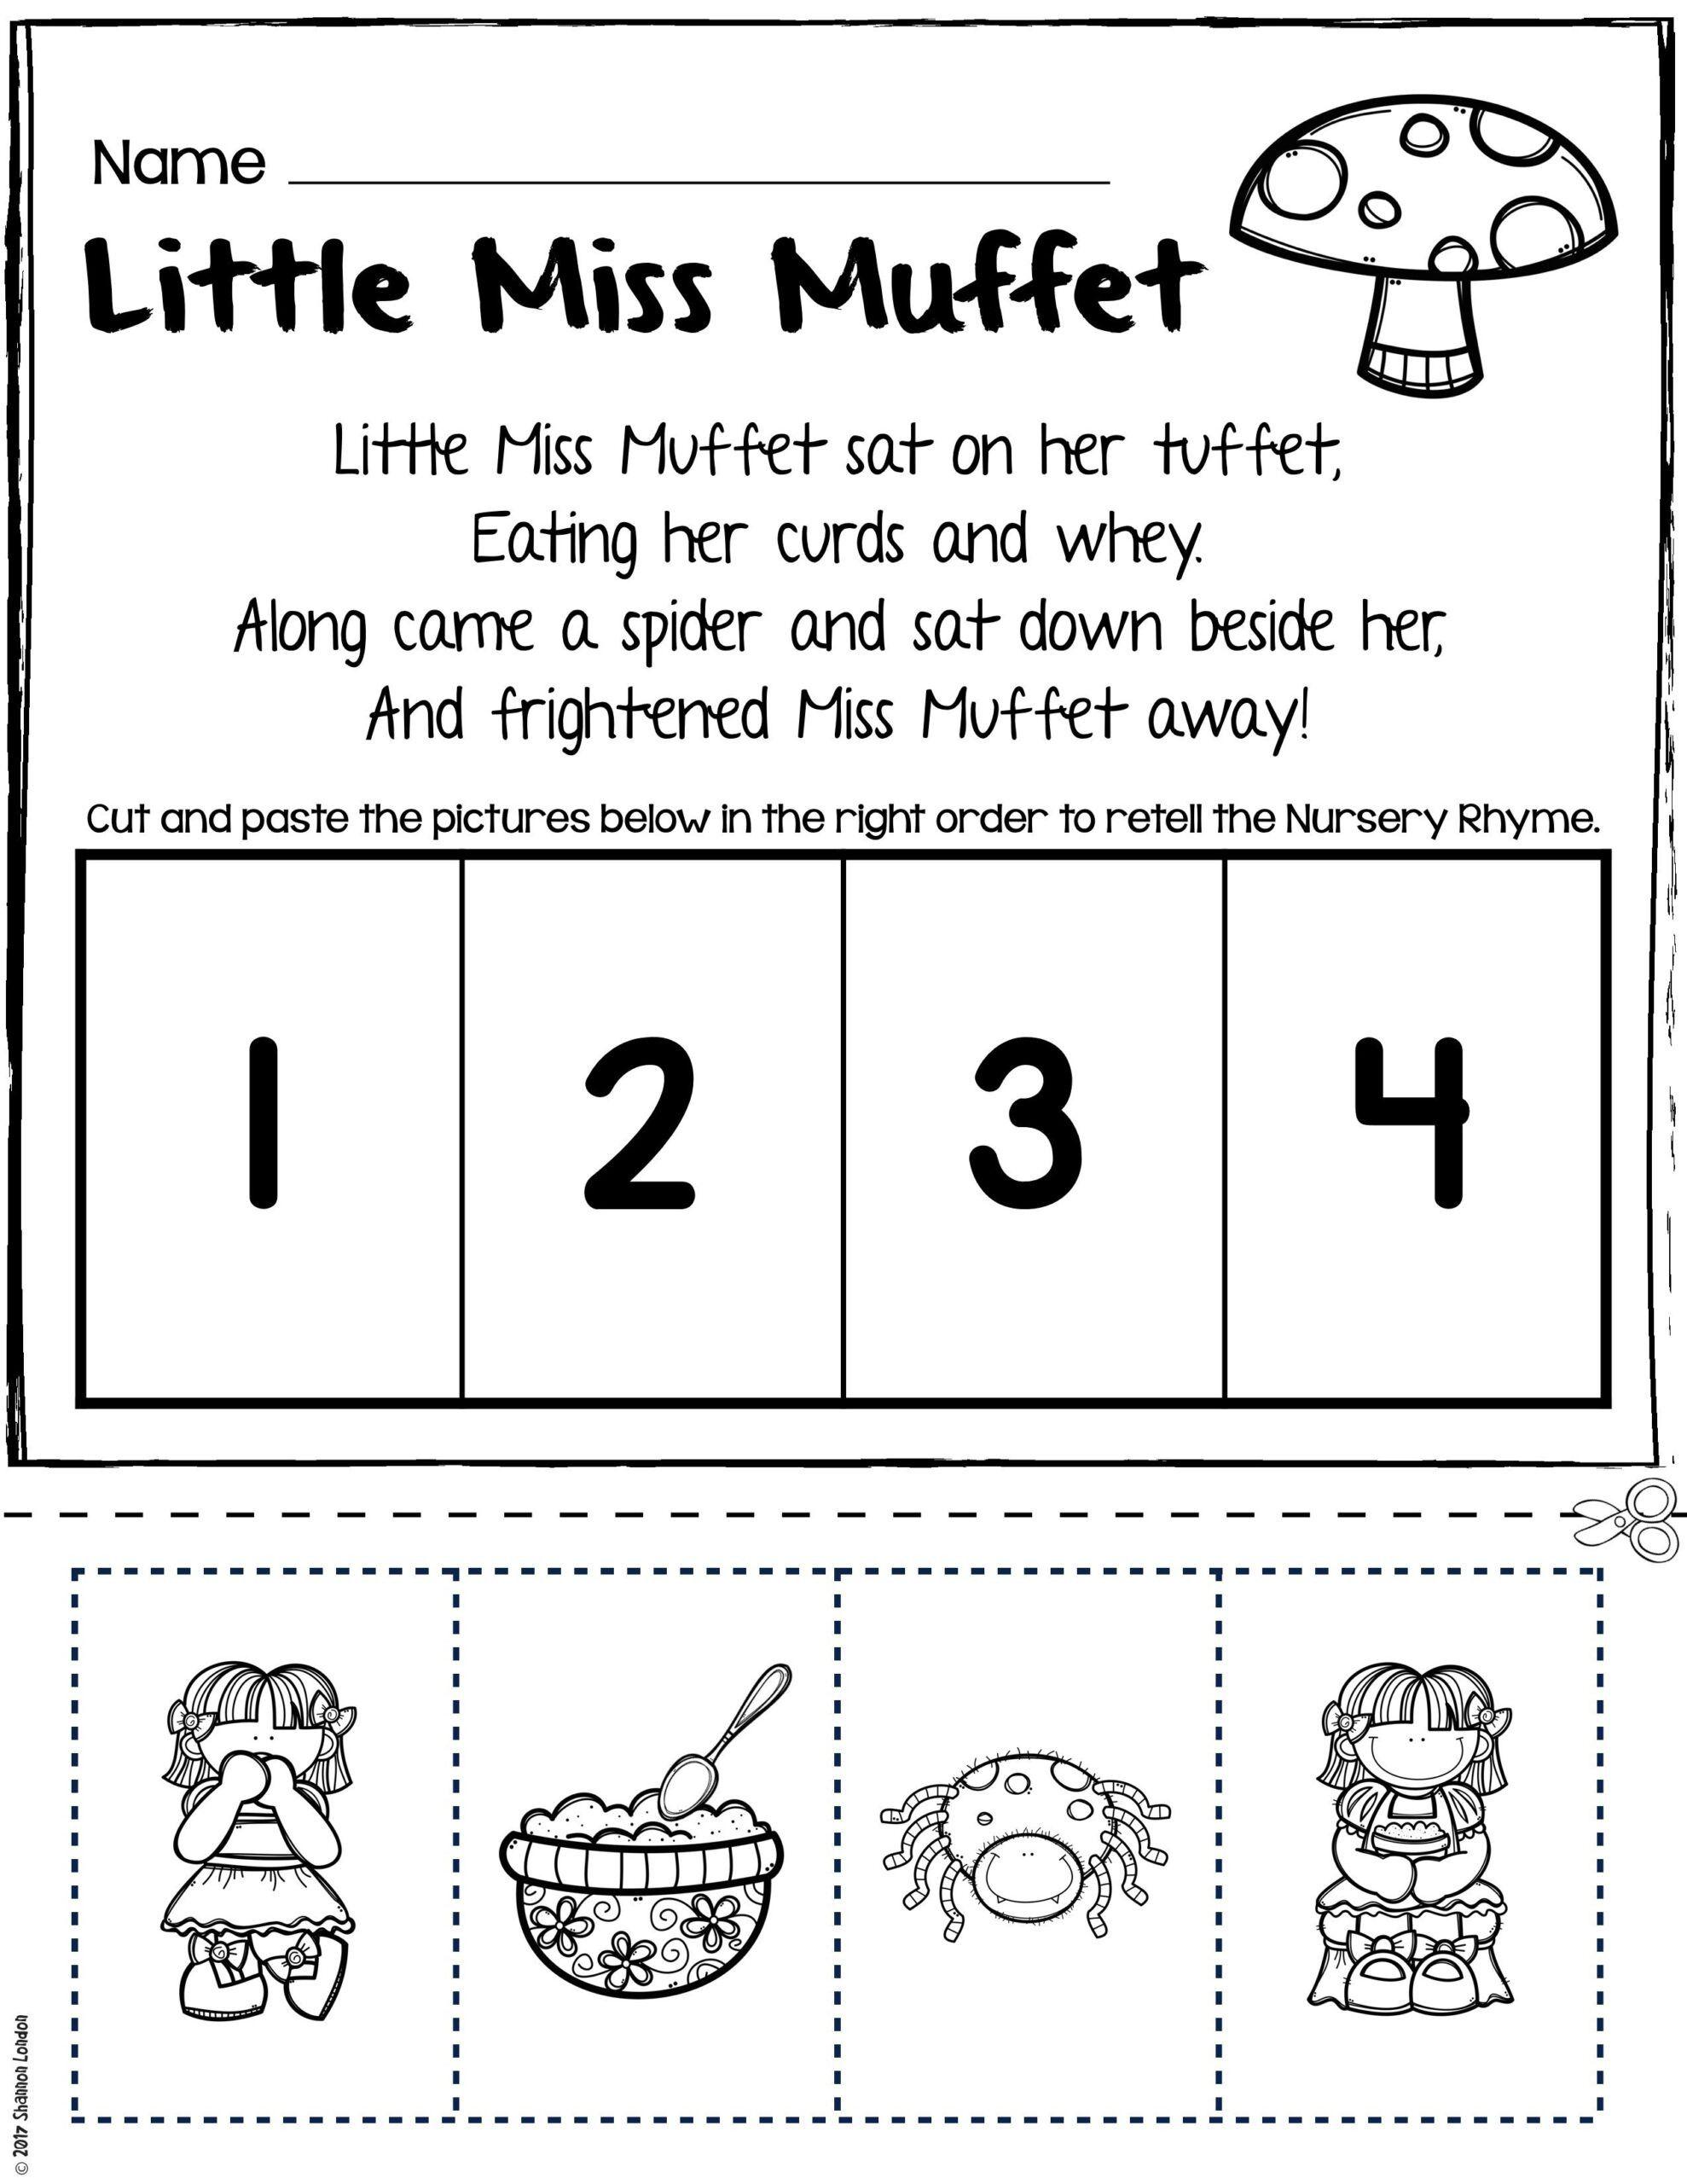 Free Rhyming Worksheets For Kindergarten Rhyming Printables For Preschool Worksheet In 2020 Rhyming Worksheet Nursery Rhymes Activities Rhyming Words Worksheets